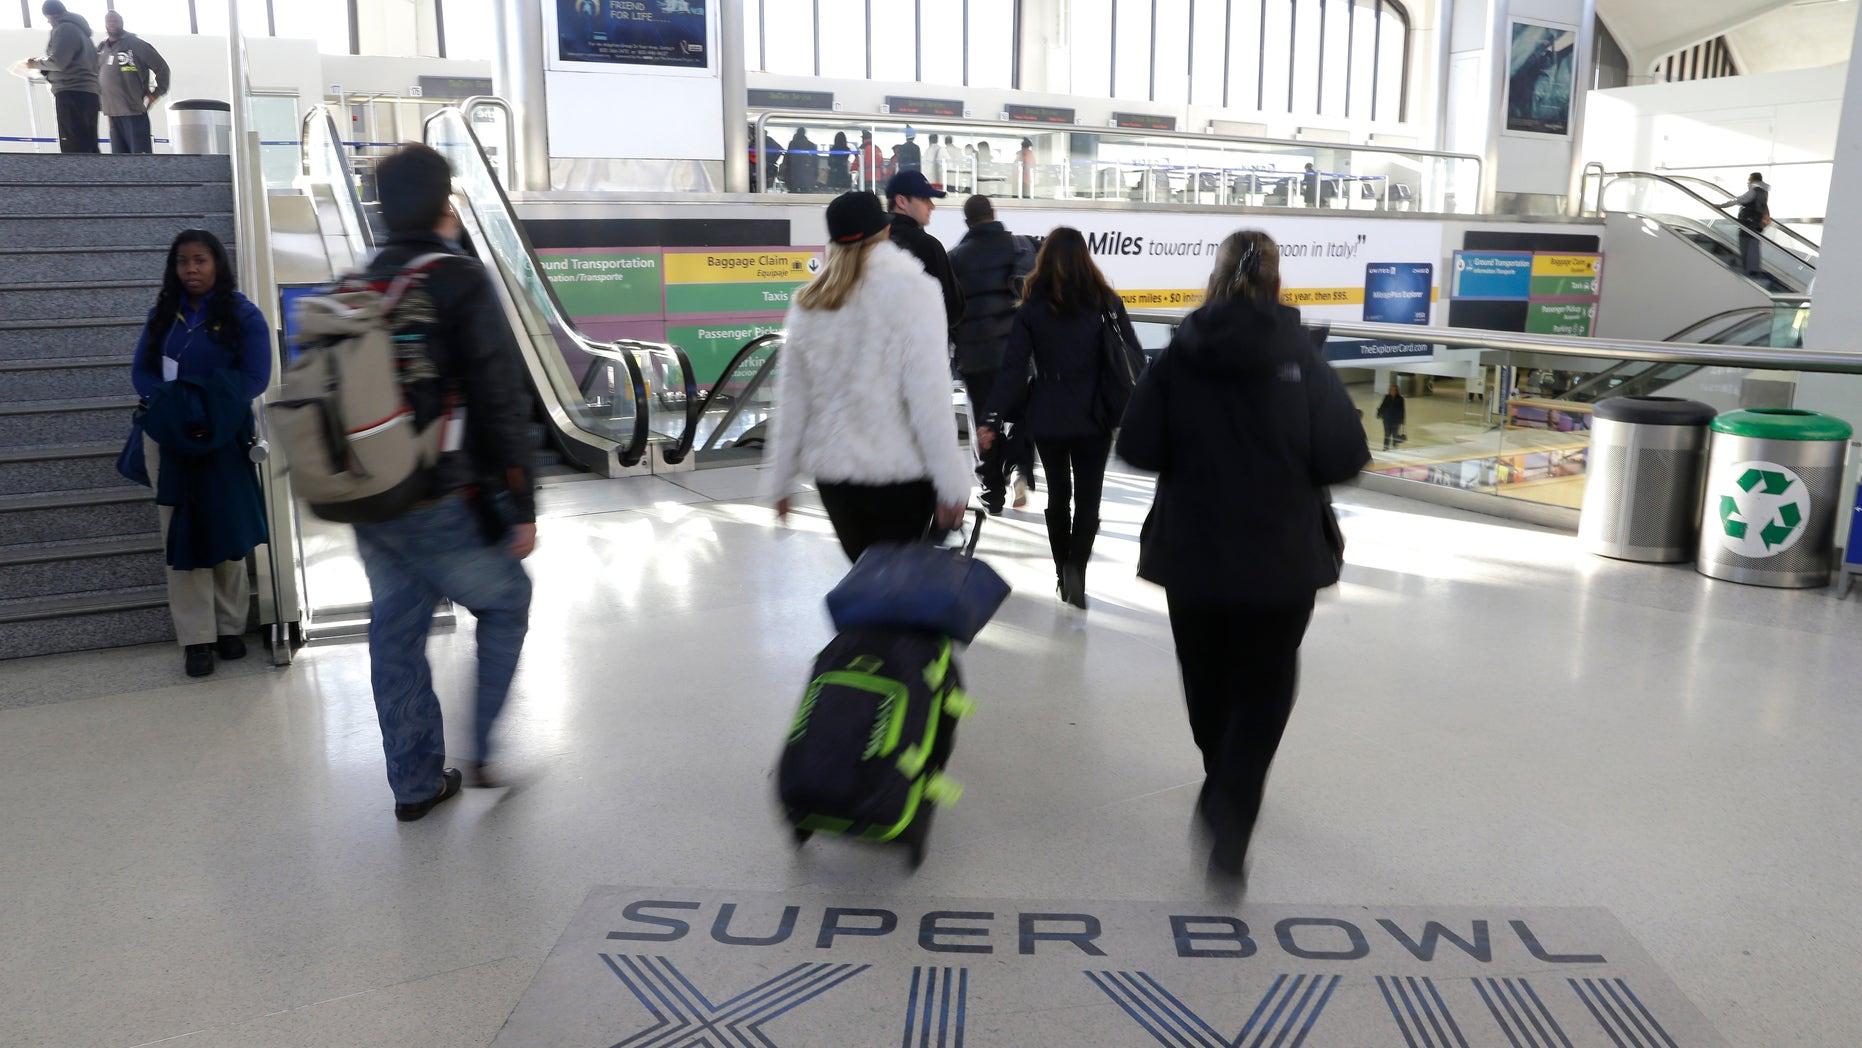 Jan. 30 2014: Arriving passengers walk past a Super Bowl sign at Newark Liberty International Airport in Newark, N.J.